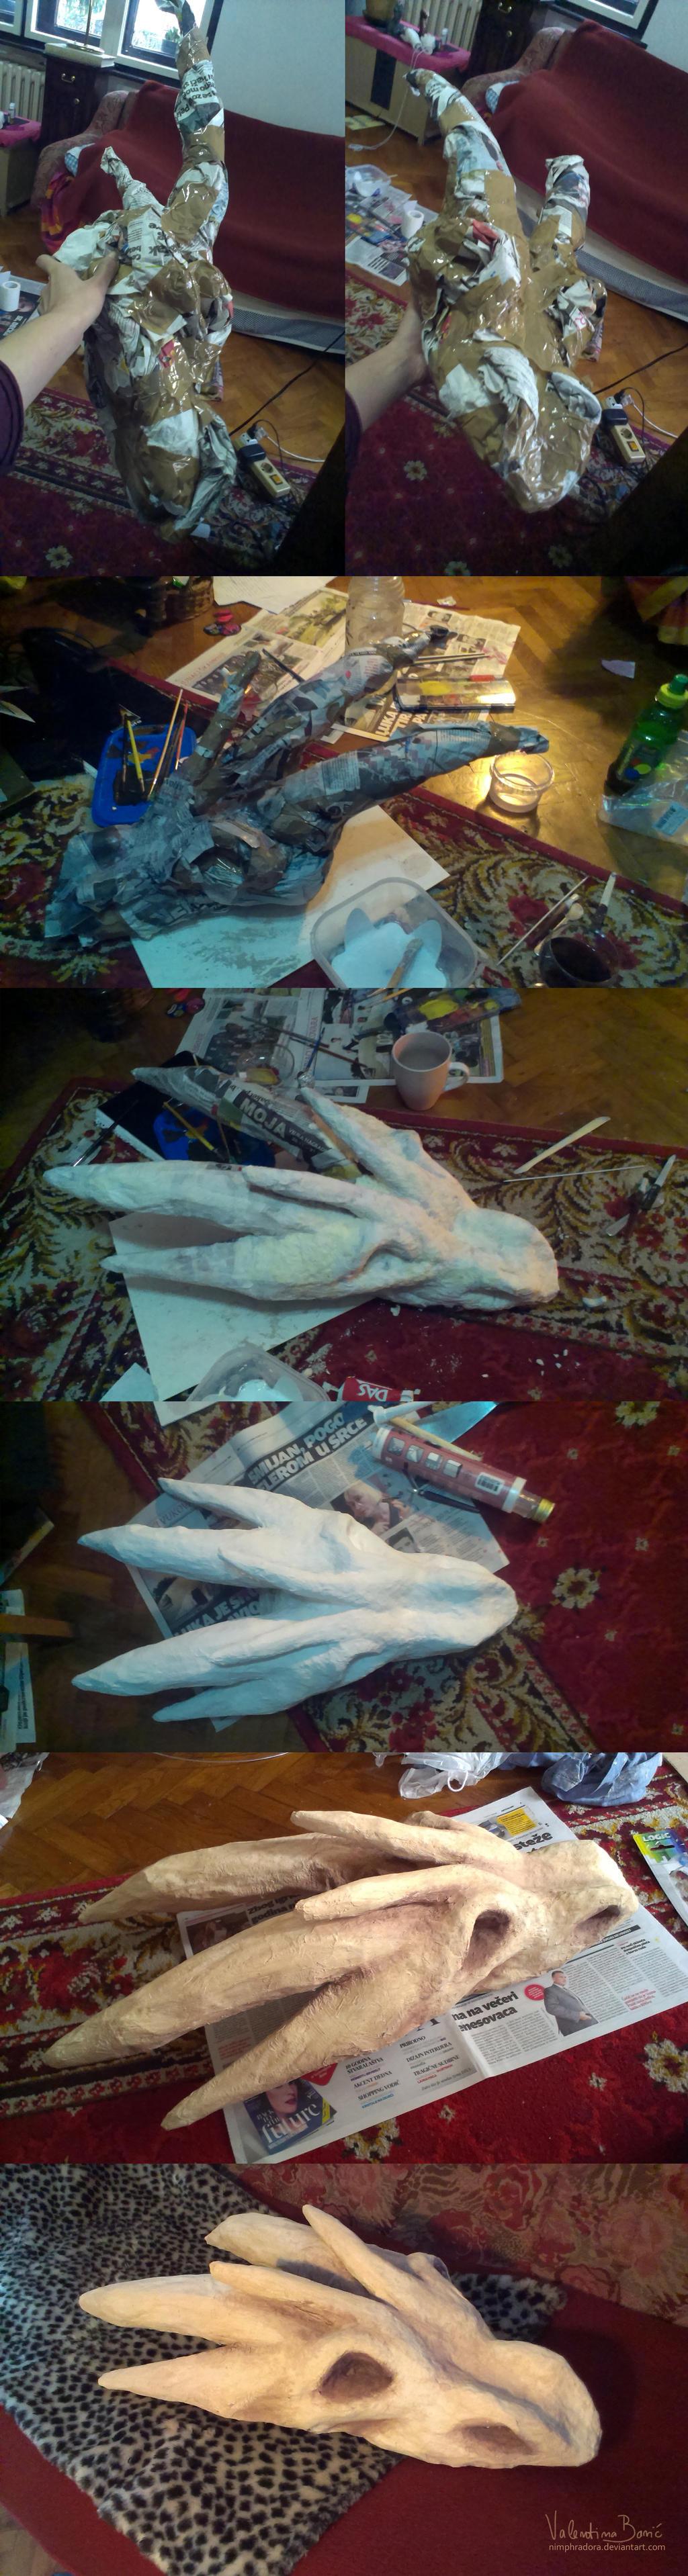 Creating paper dragon skull by Nimphradora